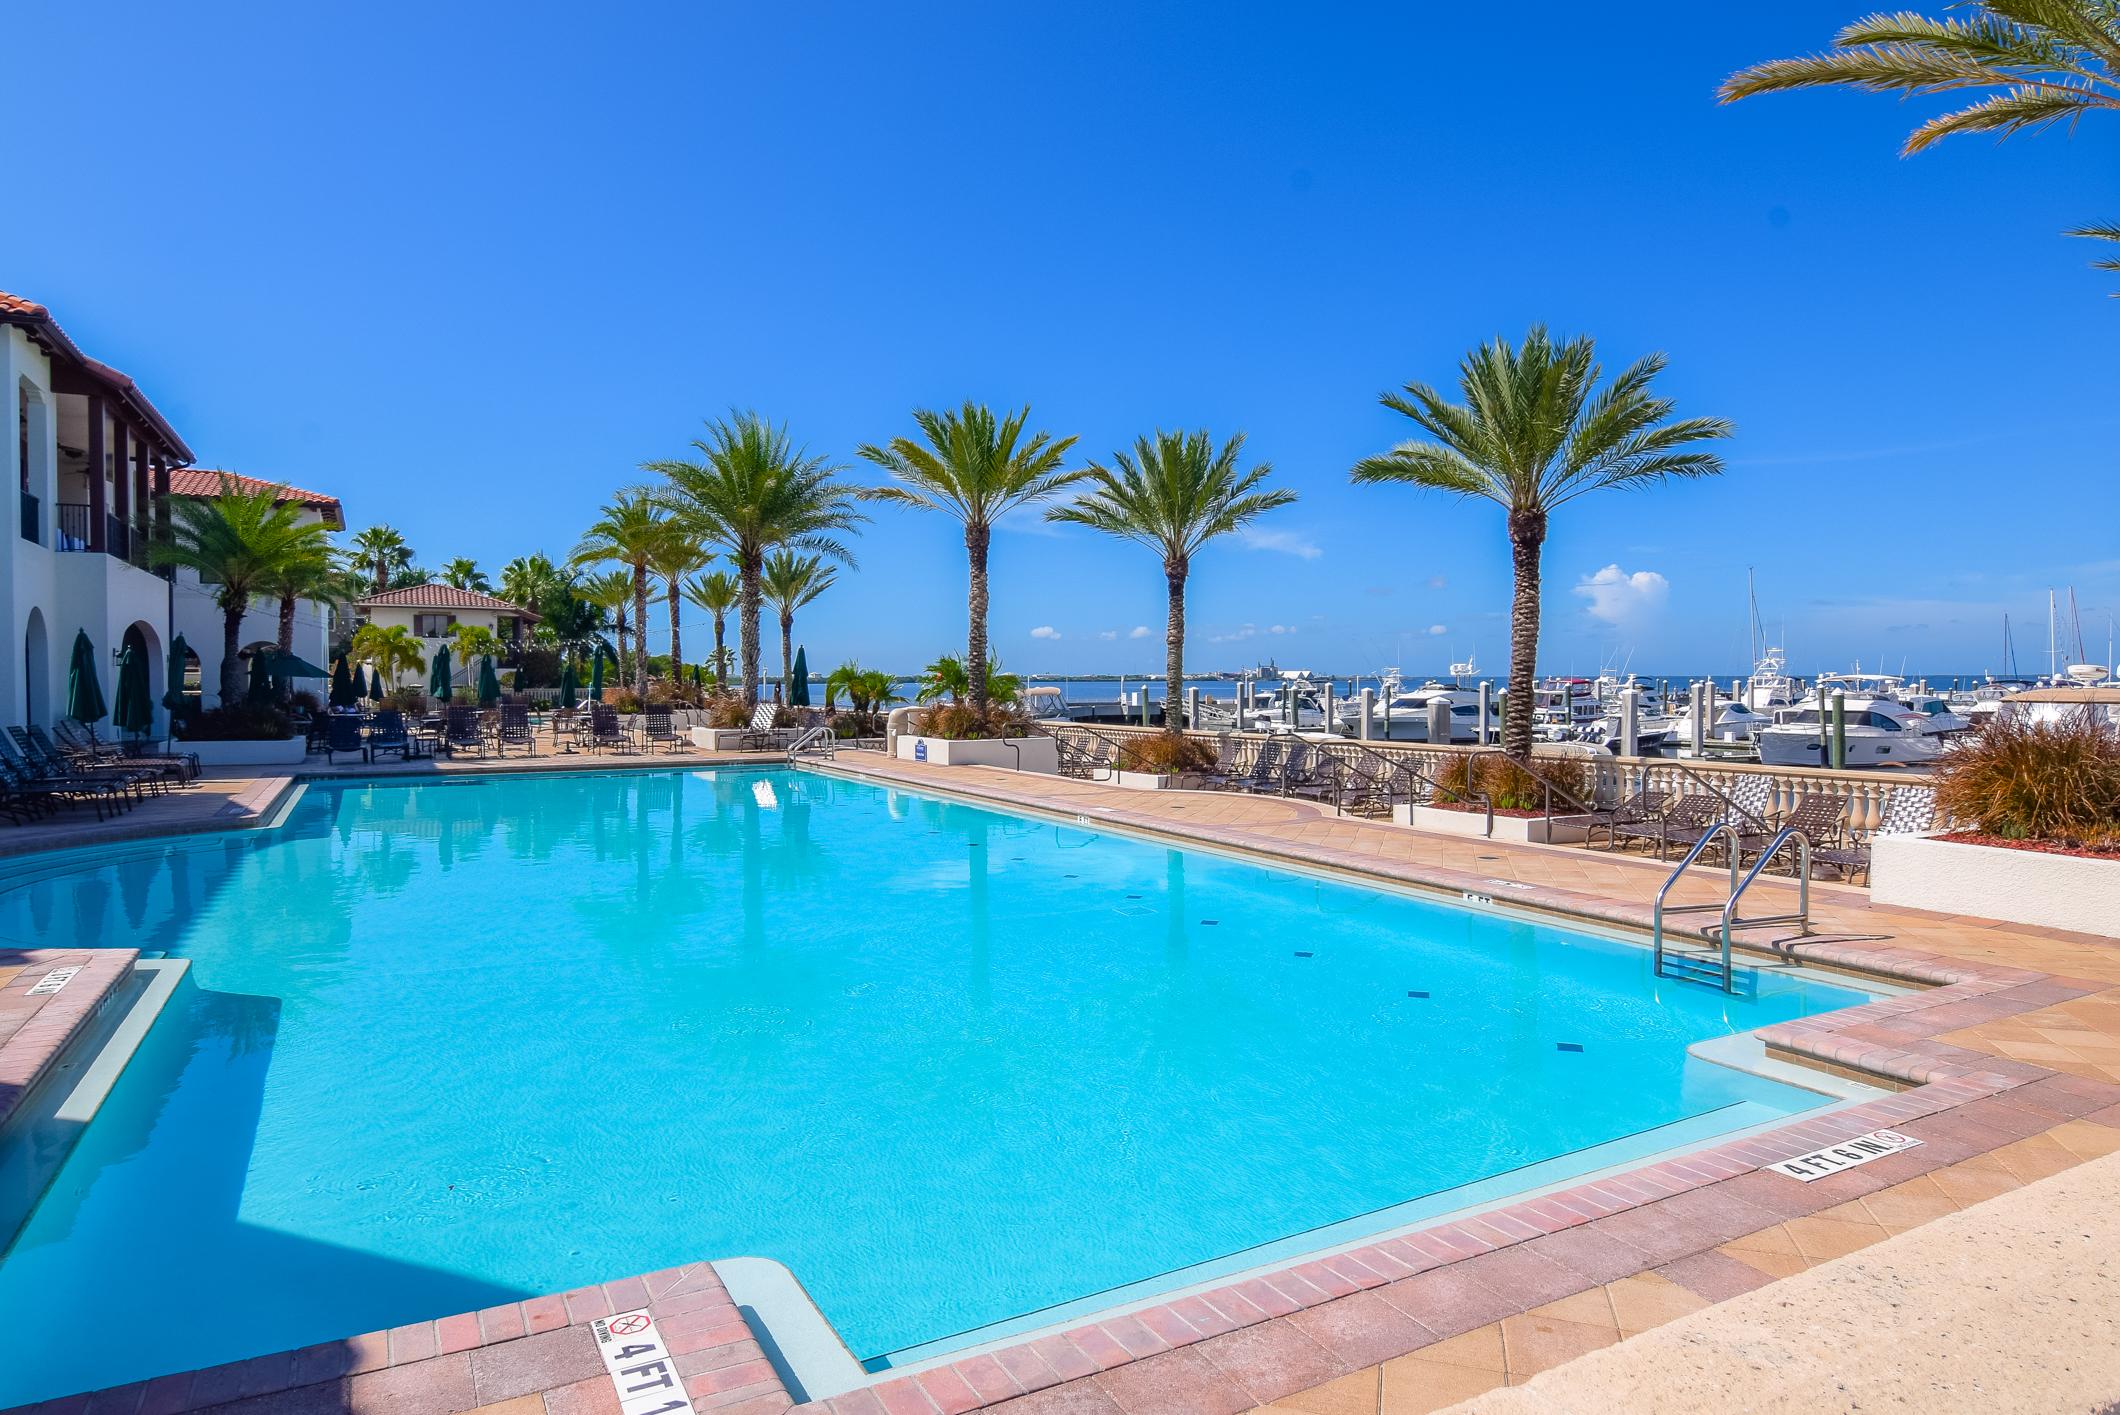 Bay Club Pool and Marina